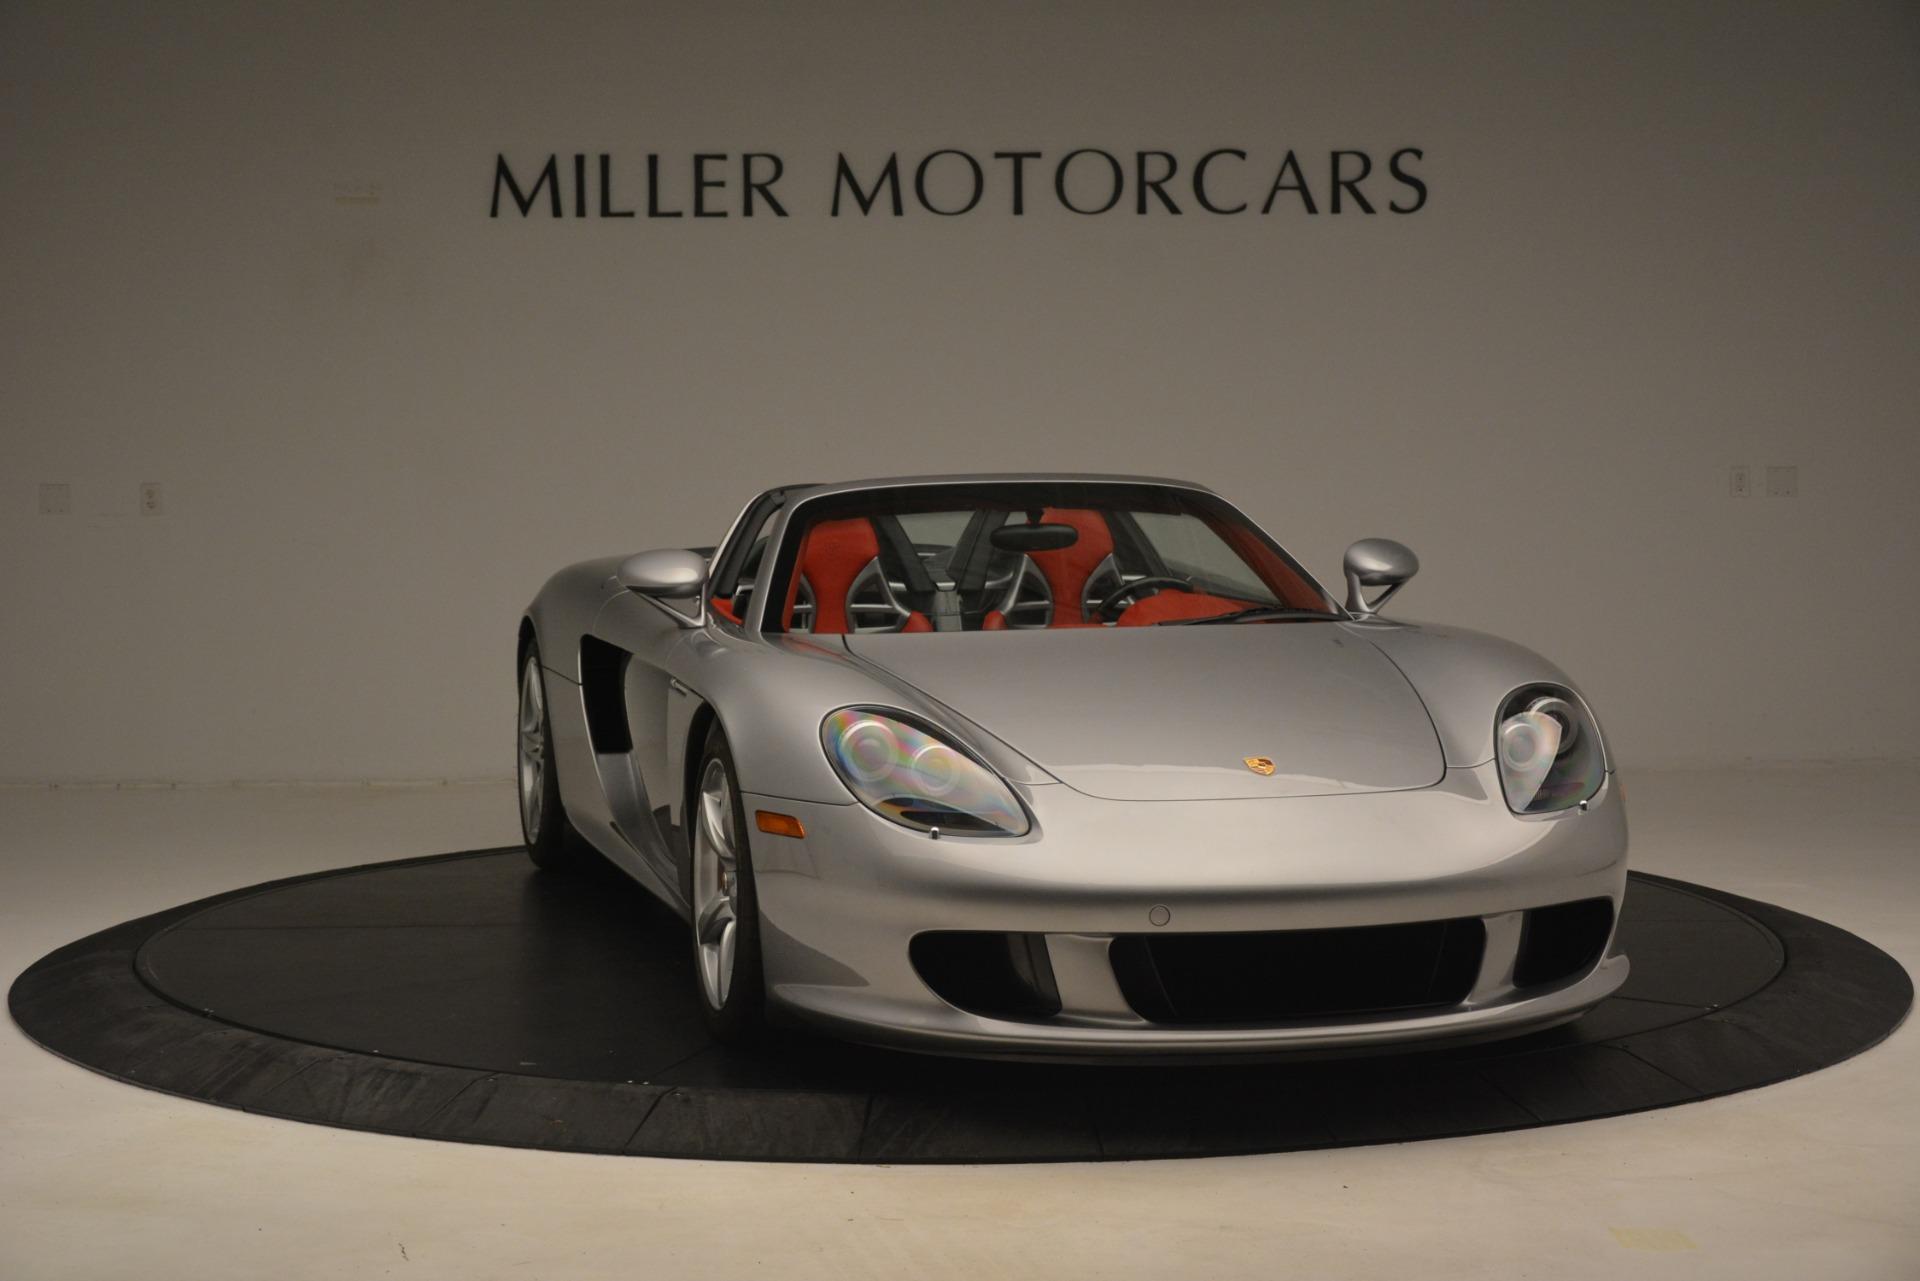 Used 2005 Porsche Carrera GT  For Sale In Greenwich, CT 3161_p13